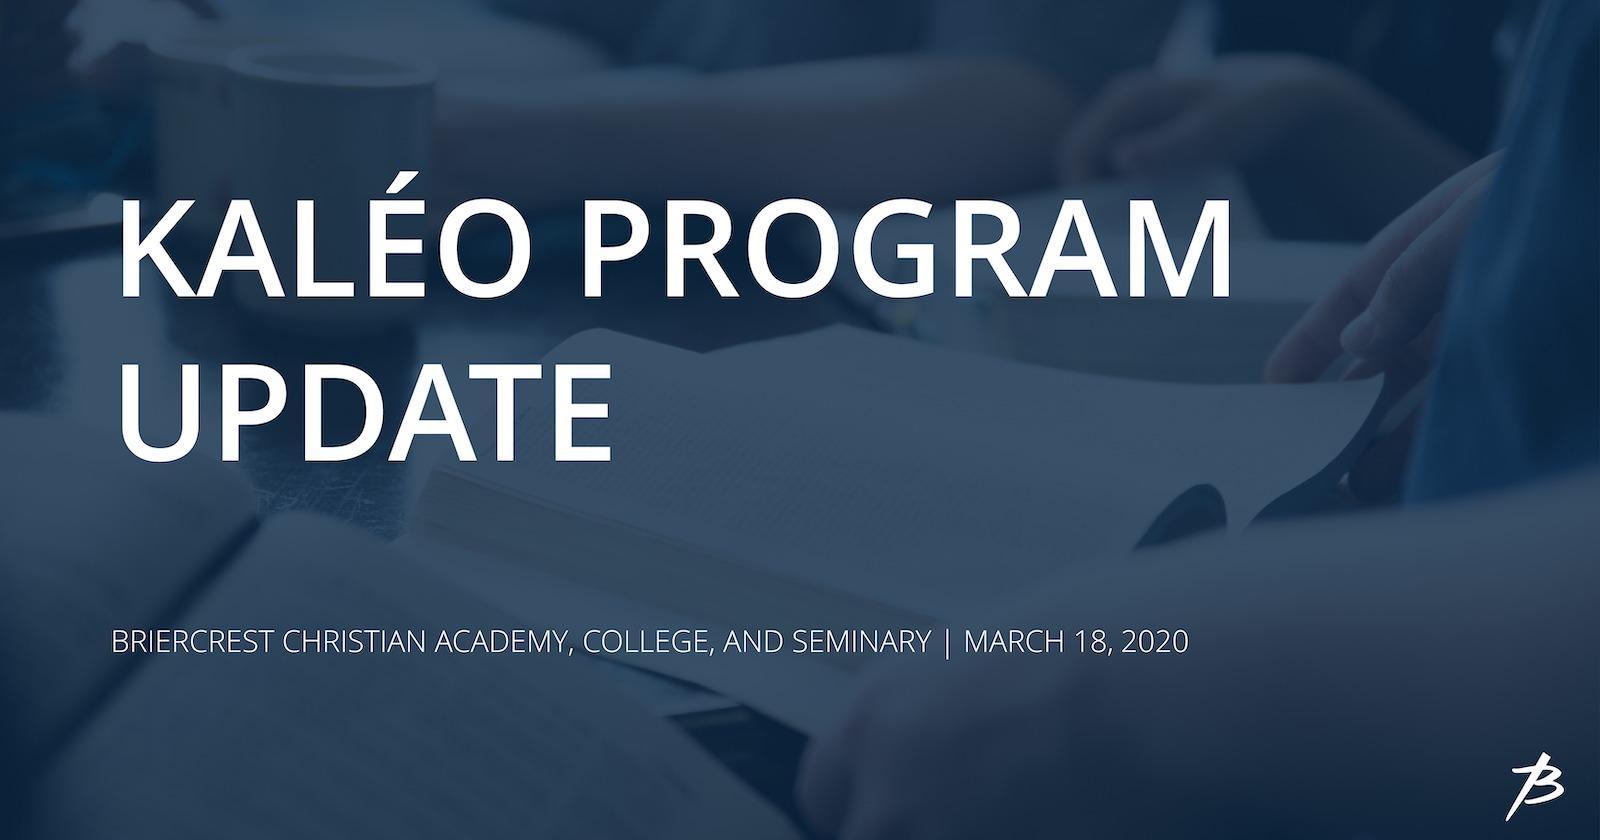 Kaleo program COVID-19 update